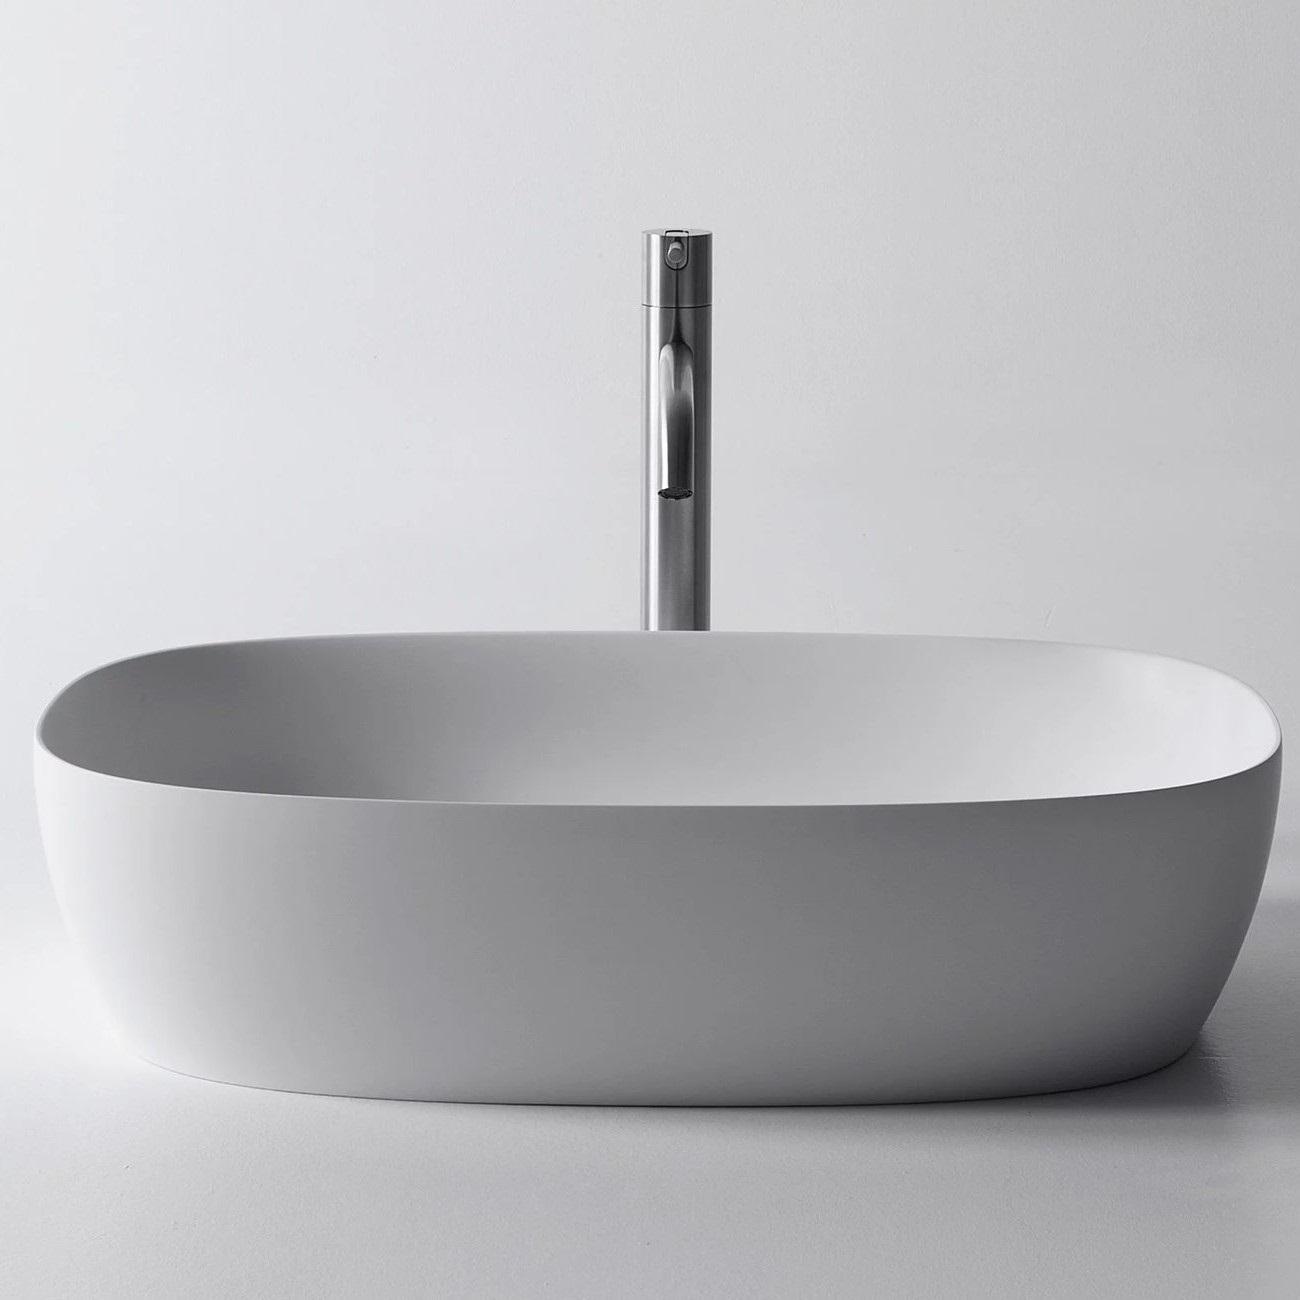 Senso Square Lavabo.Antonio Lupi Senso Sink